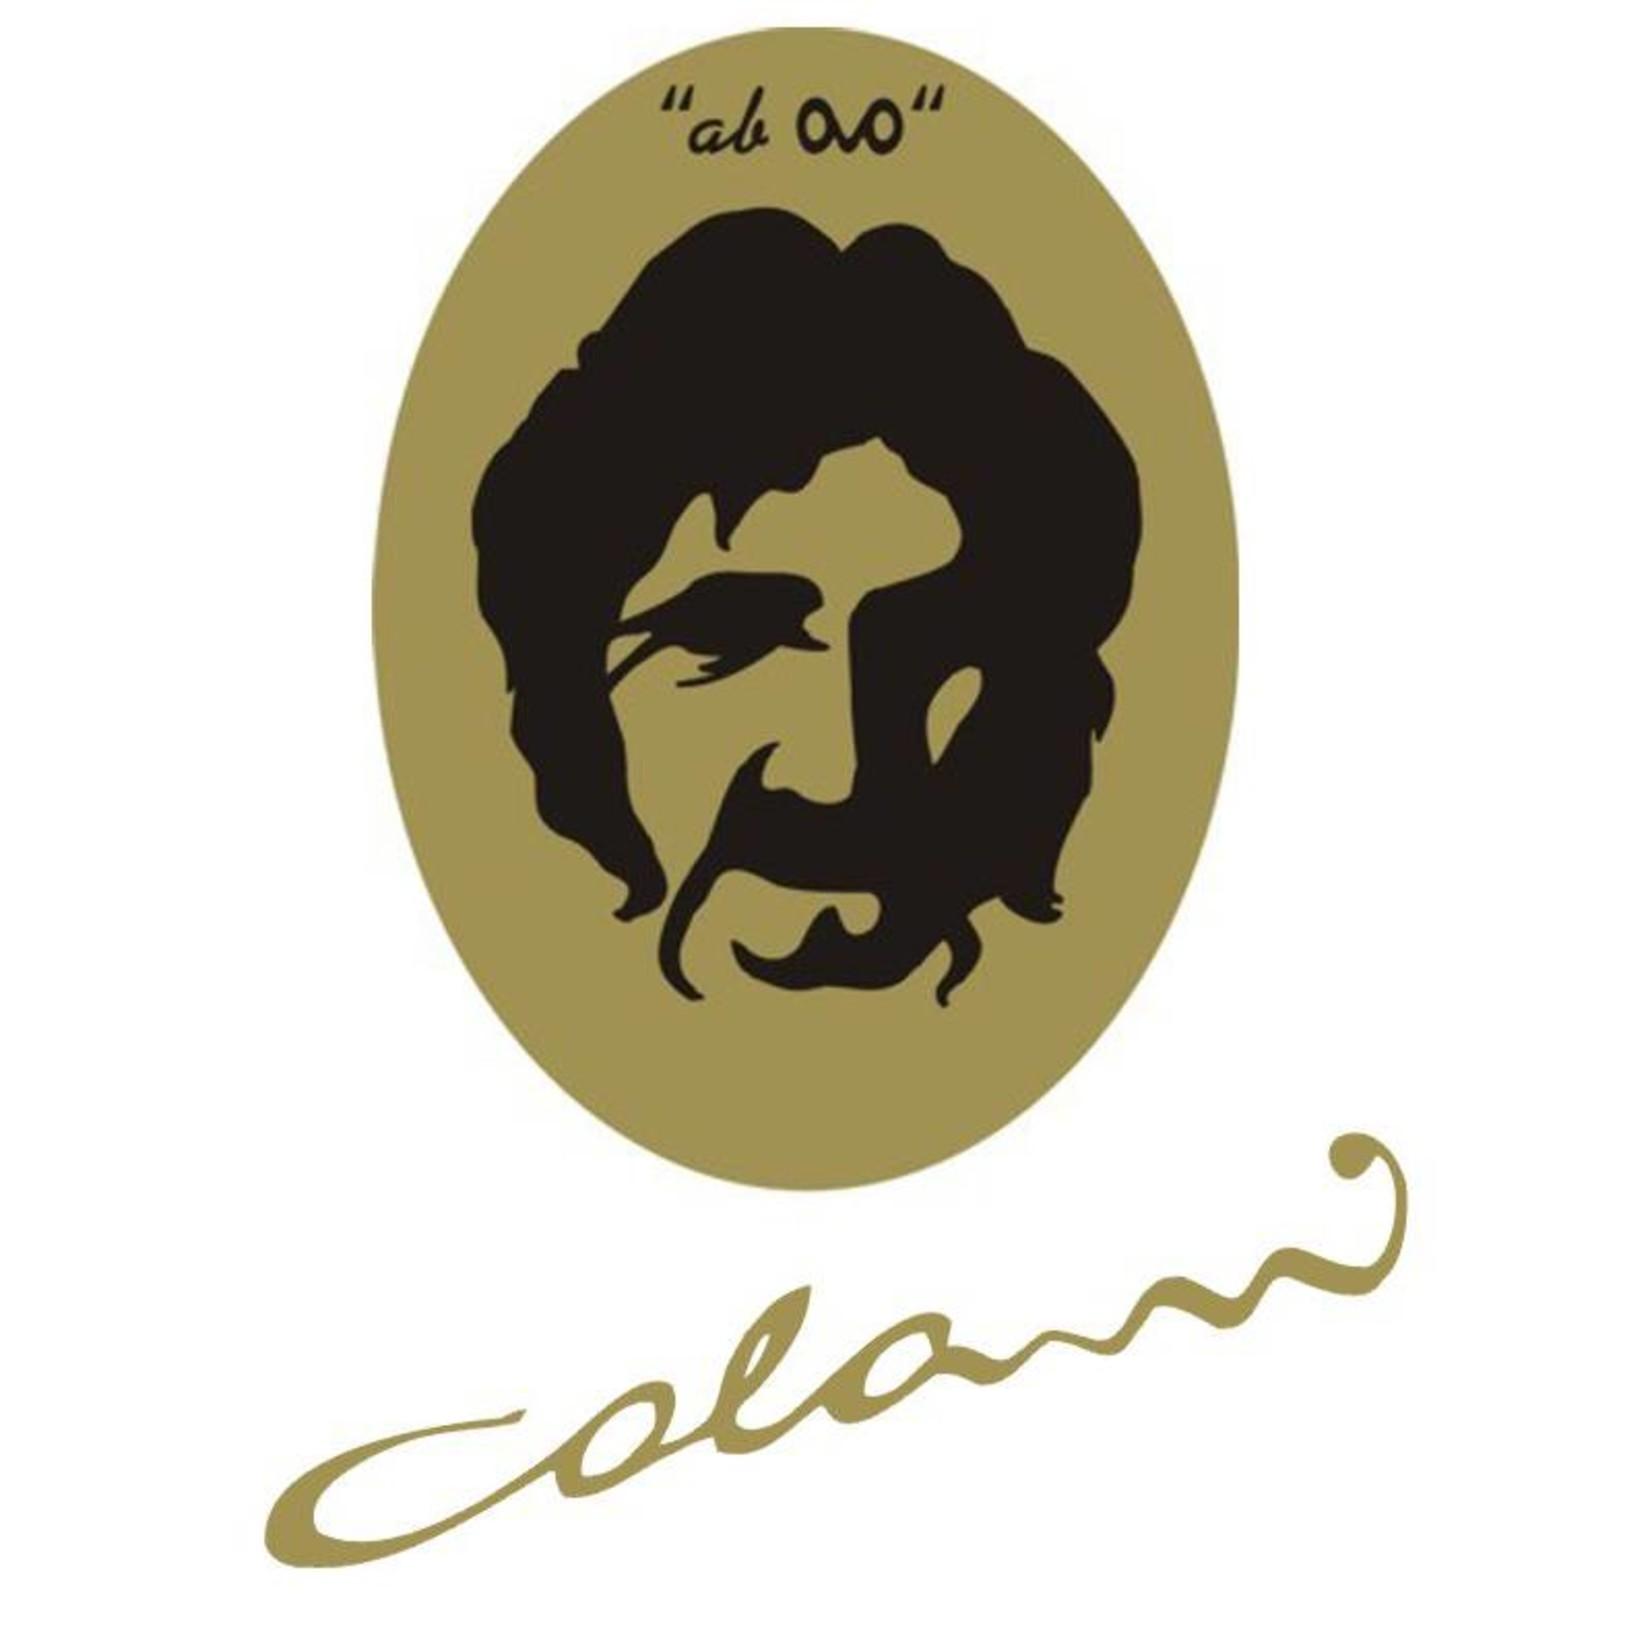 Colani Porzellanserie Colani Kaffee-/Cappuccinotasse | Tasse inkl. Unterteller | grün